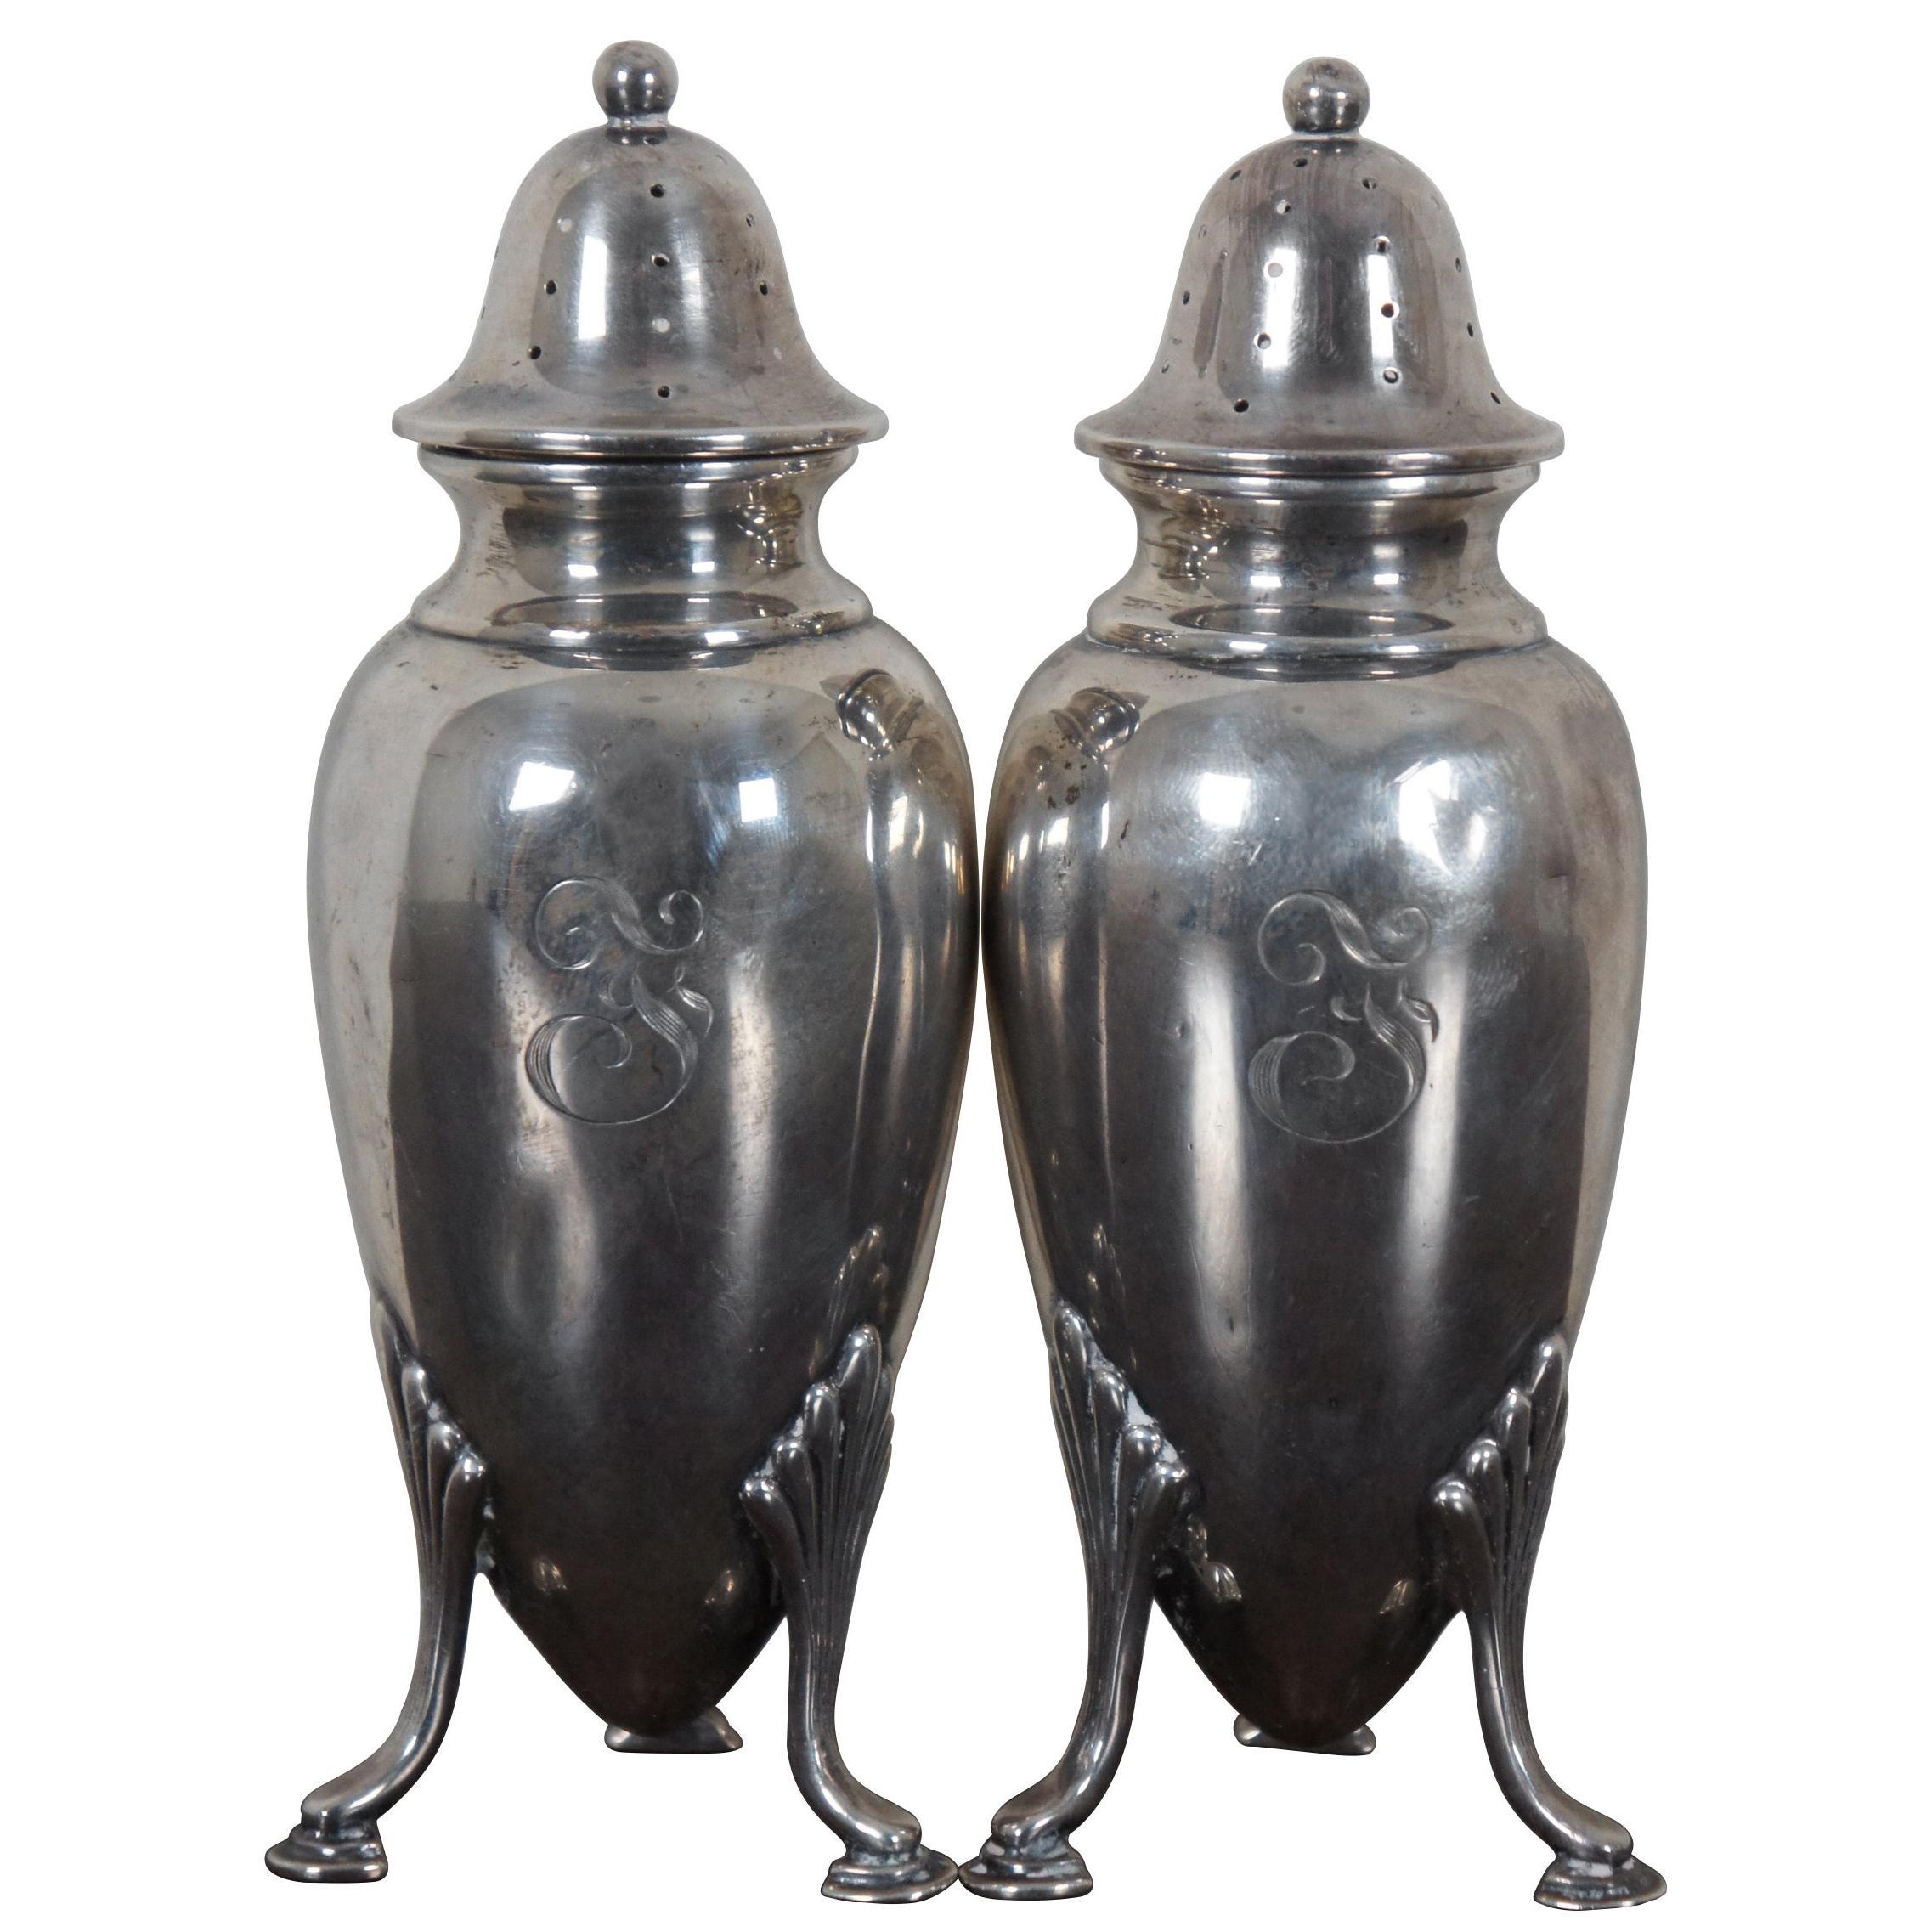 Antique Frank Herschede Co Sterling Silver Footed Salt & Pepper Shakers 5409